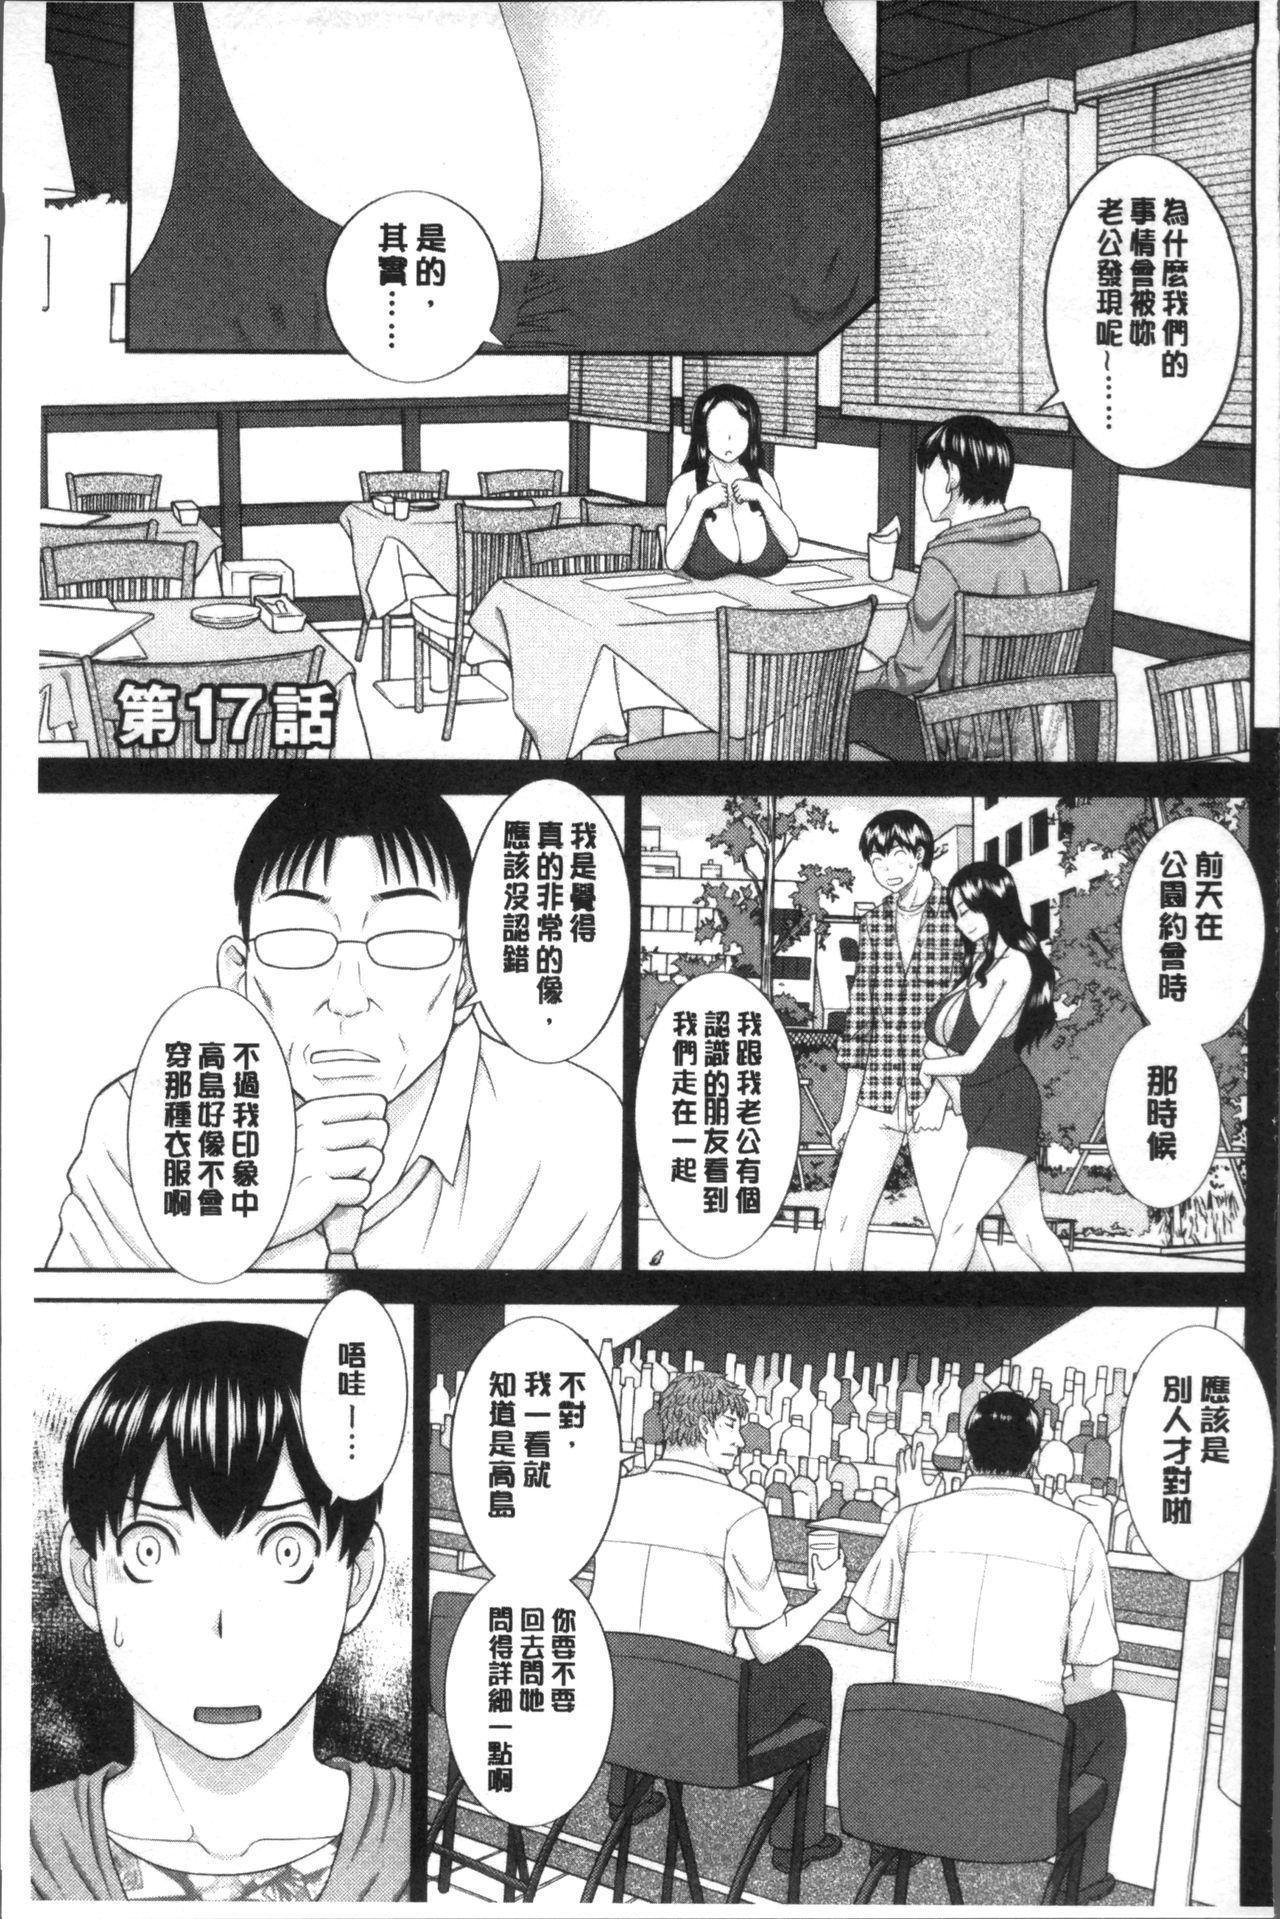 [Kawamori Misaki] Innyuu Shufu no Futei Ganbou - Oku-san to Kanojo to 2 | 淫乳主婦的不貞願望 和人妻也和女友❤2 [Chinese] 132